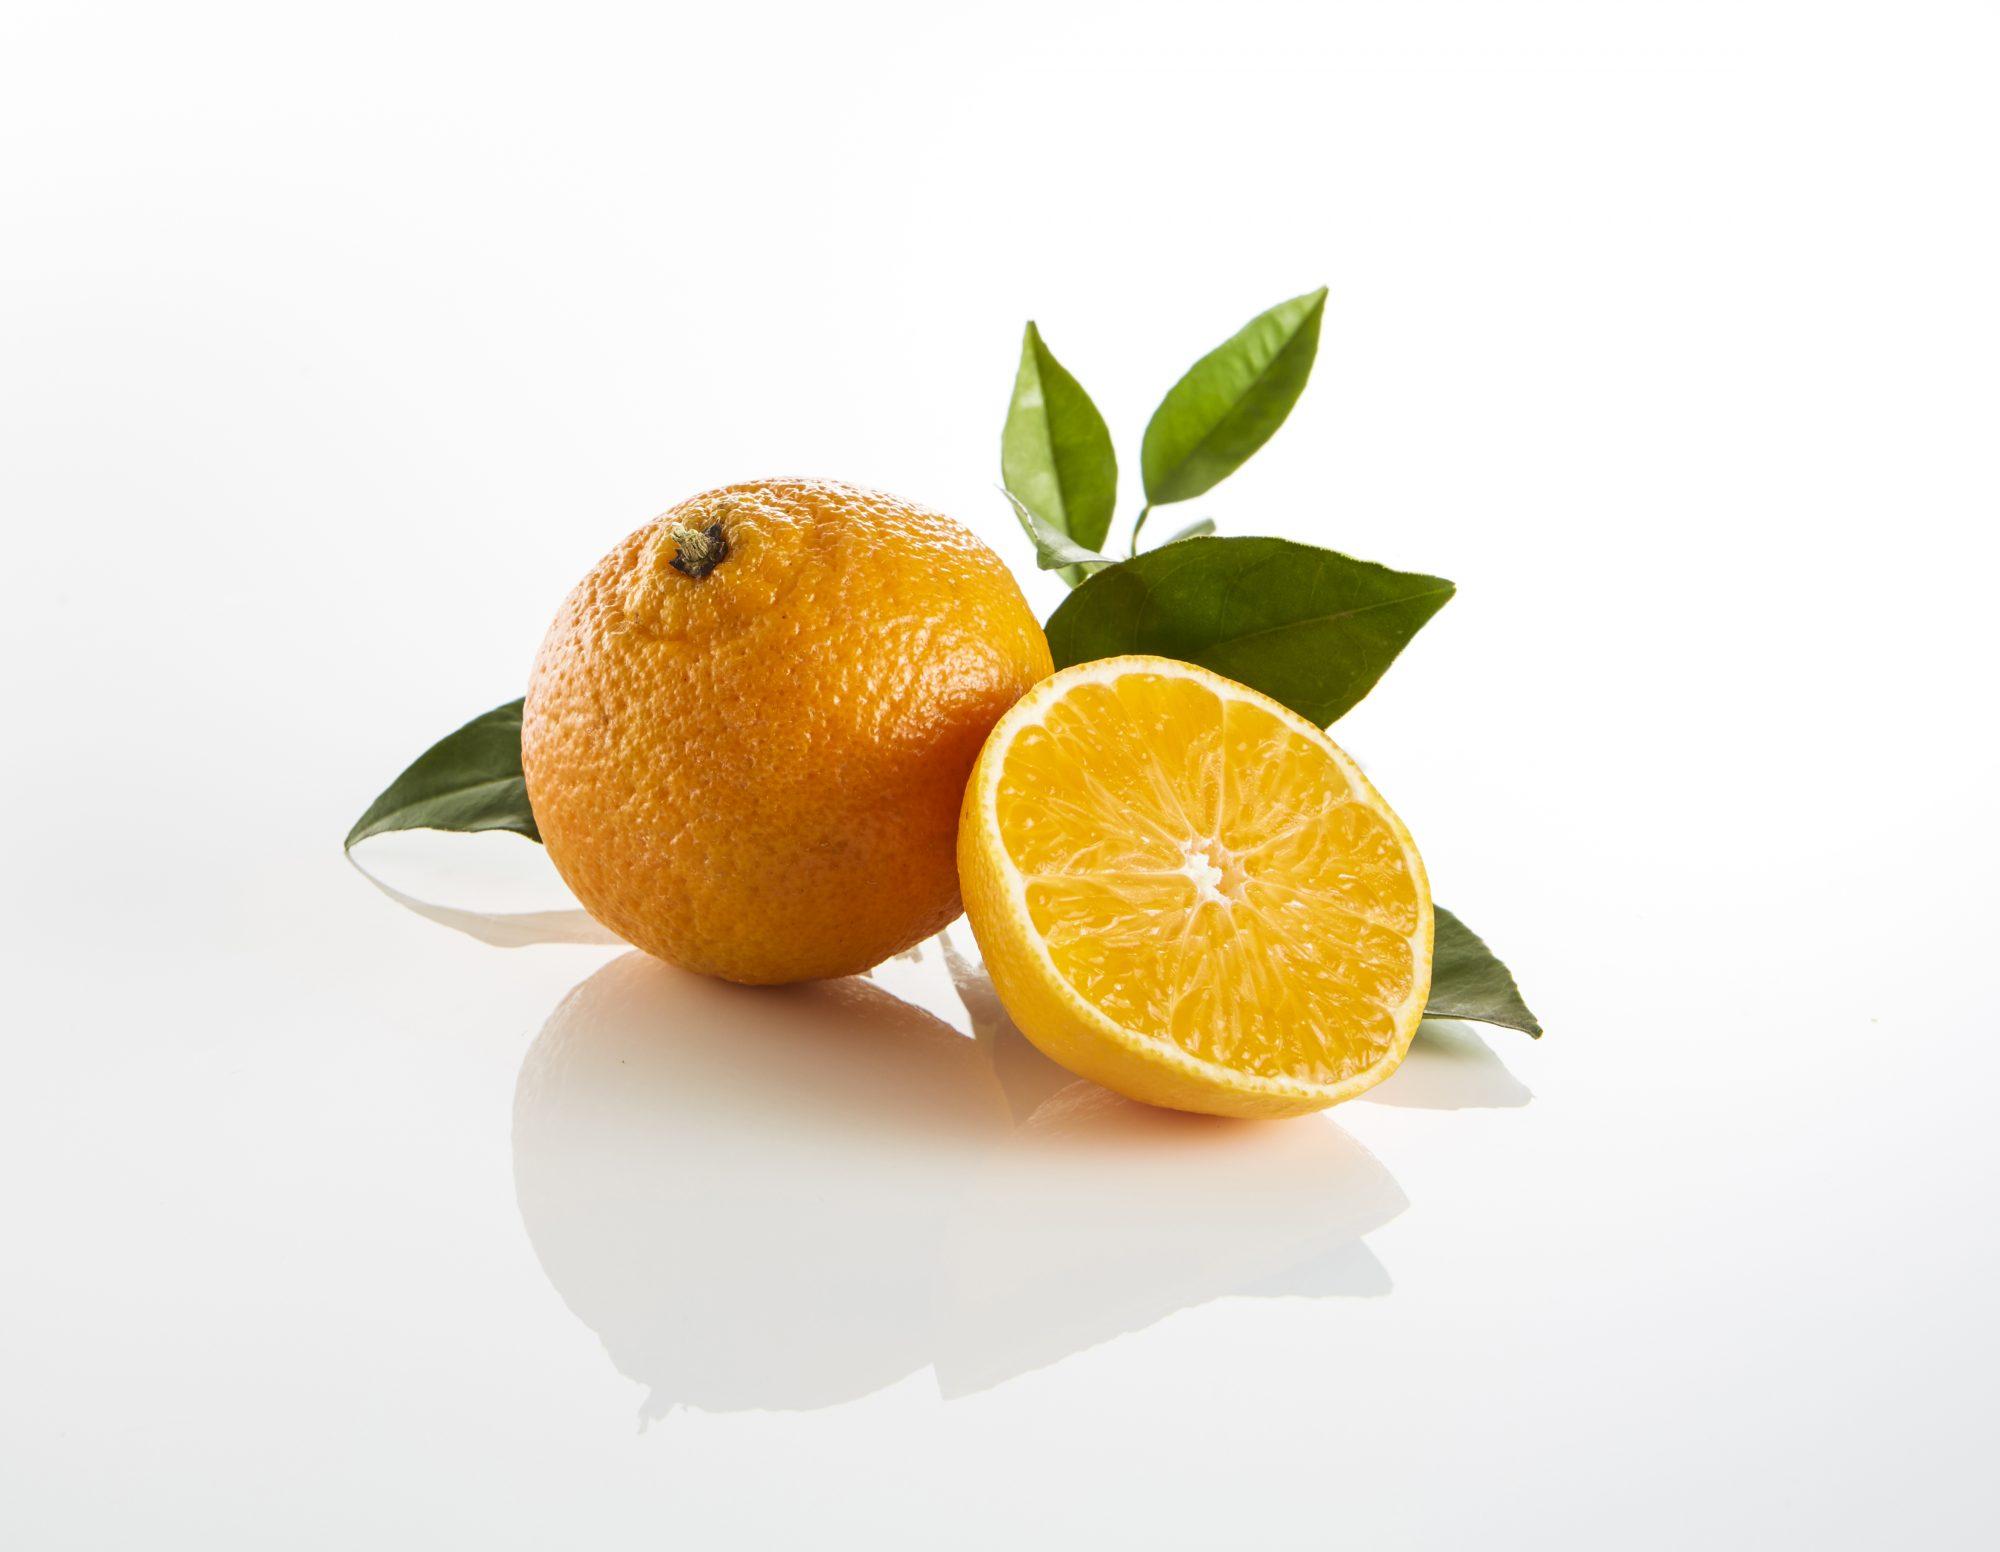 Tangerine image